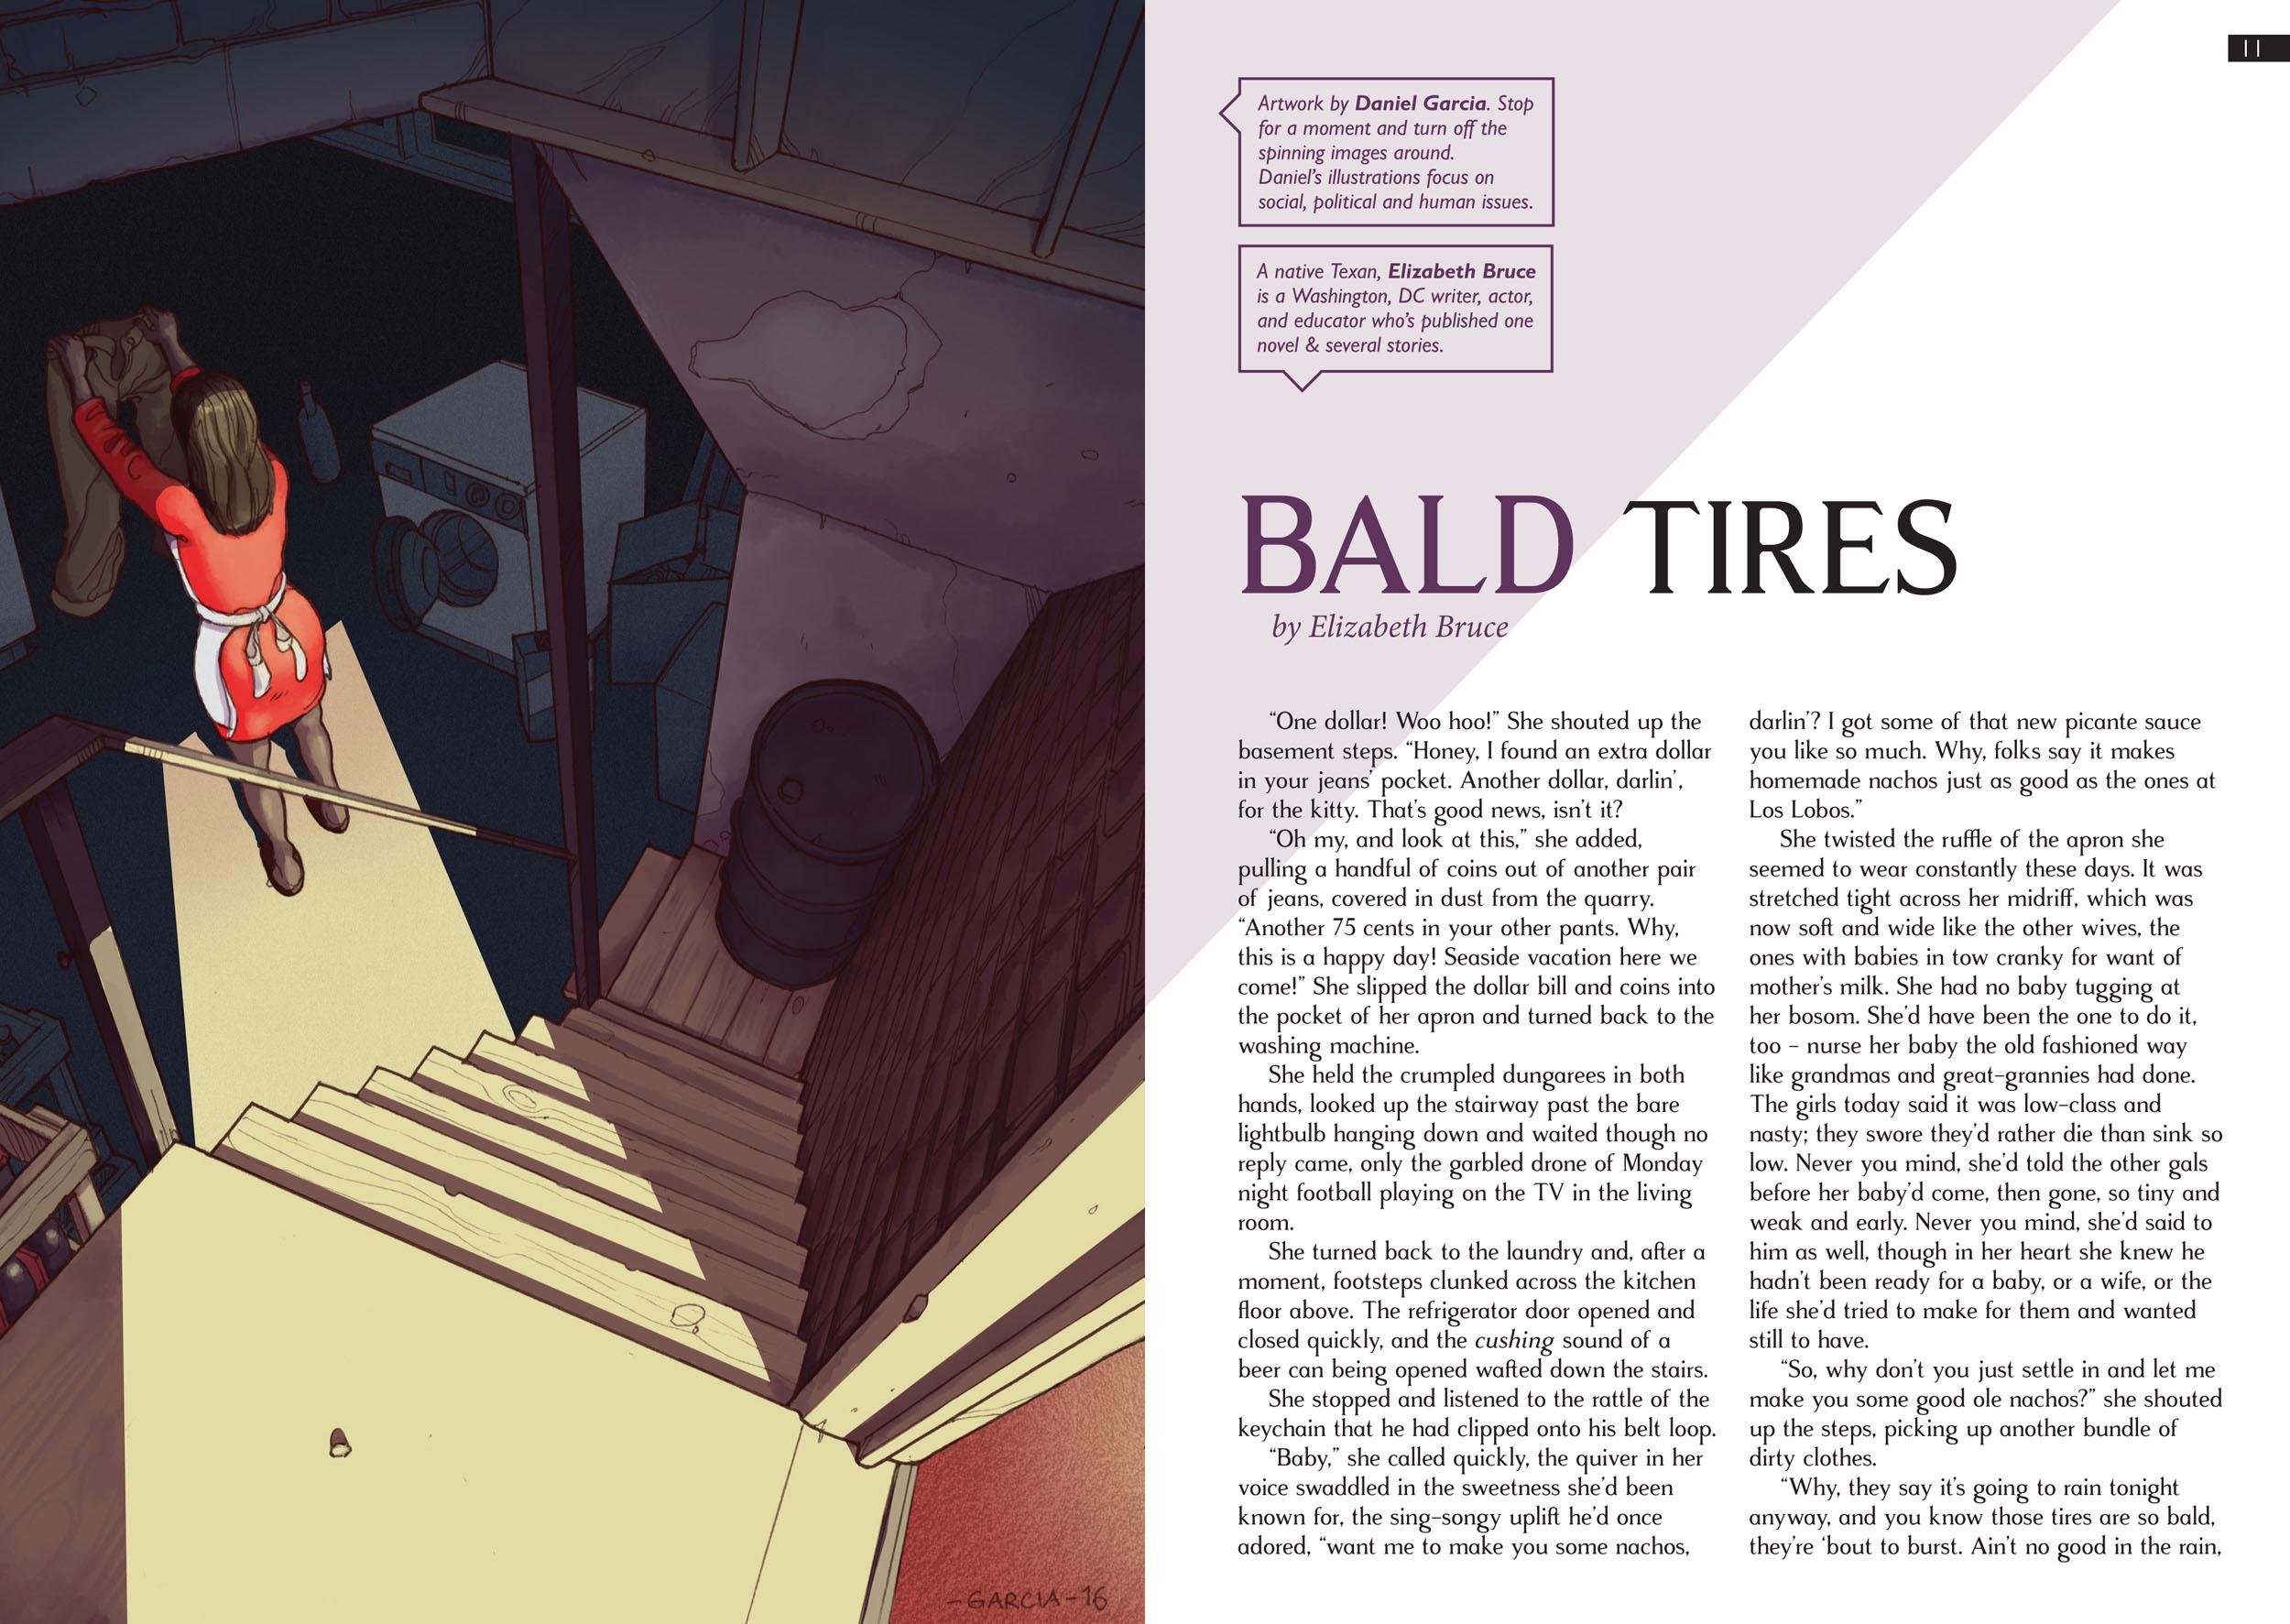 Daniel Garcia Art Illustration Bald Tires Firewords Woman Housewife Basement 02